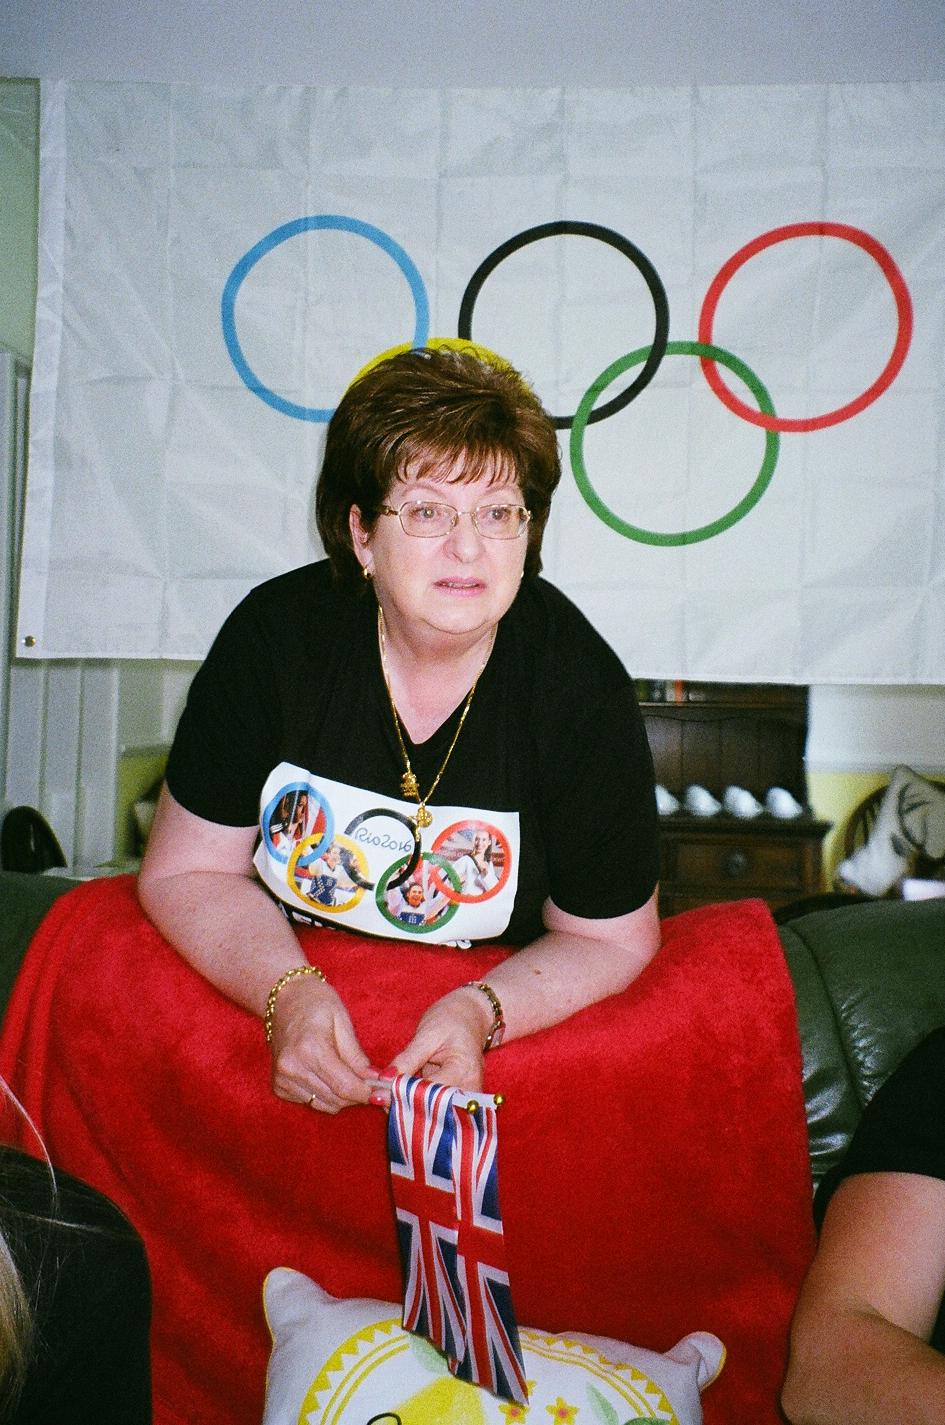 Bianca-Olympics-number3.jpg